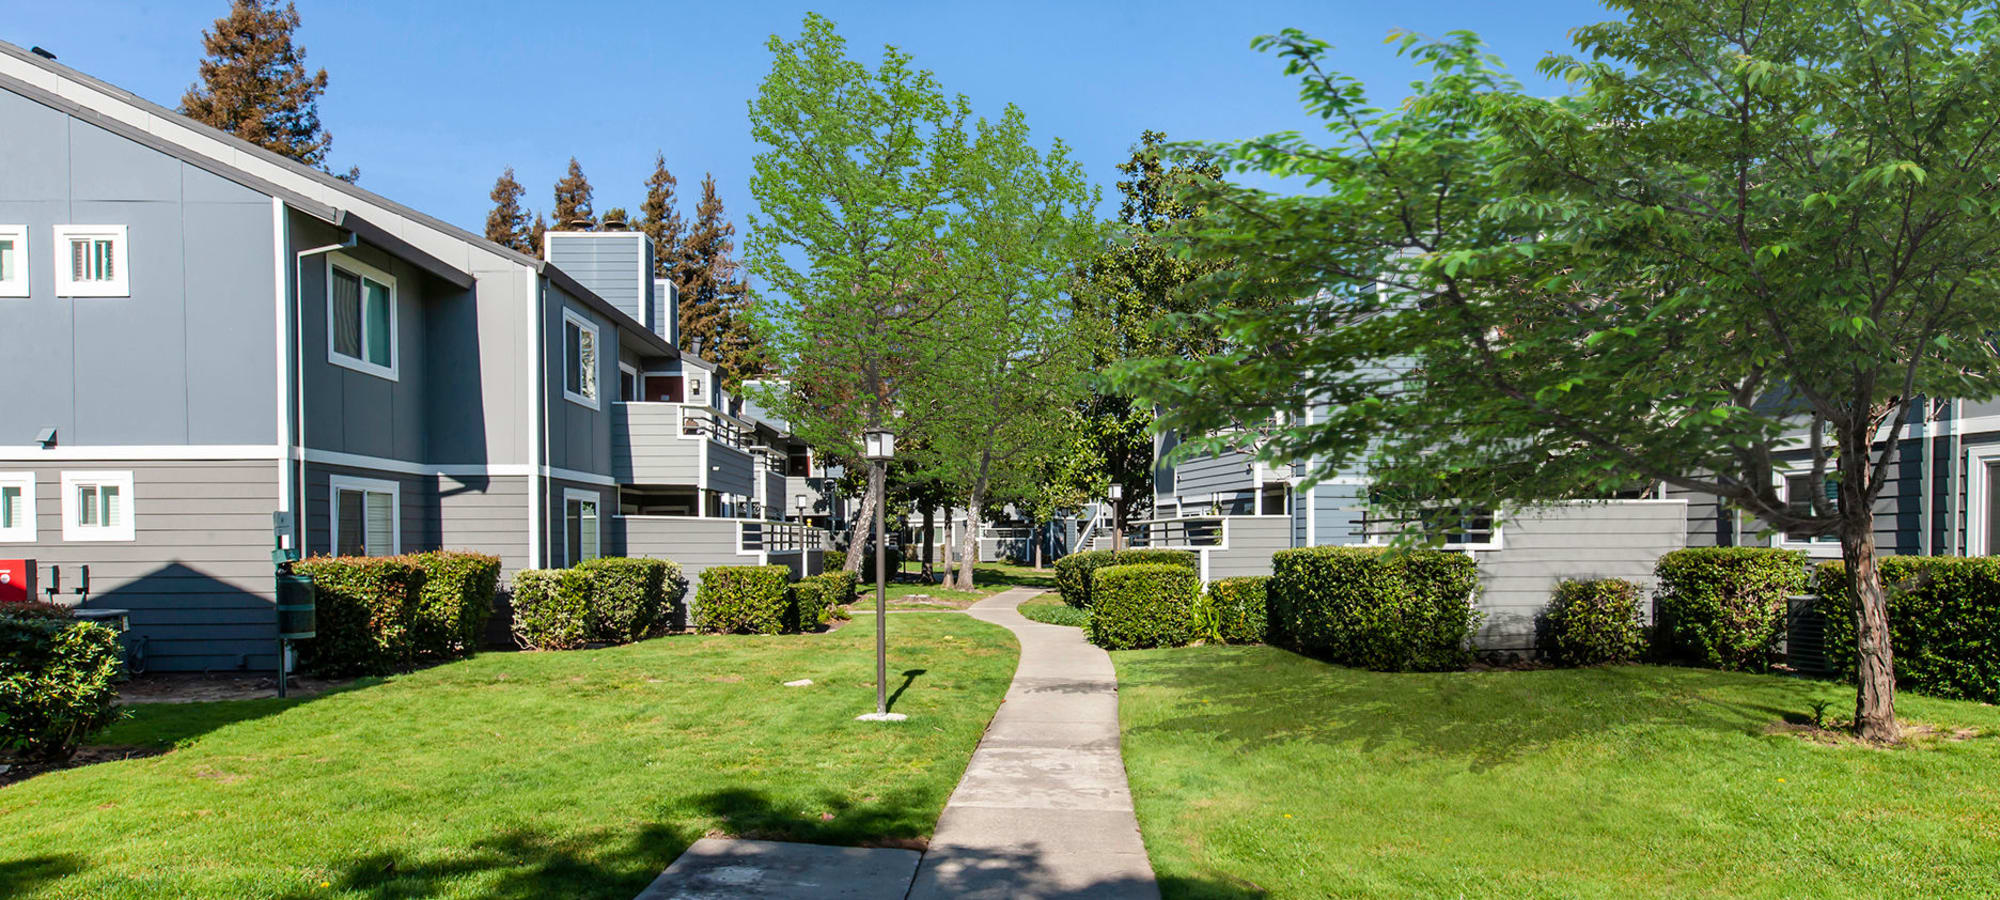 Apartments from Bennington Apartments in Fairfield, California